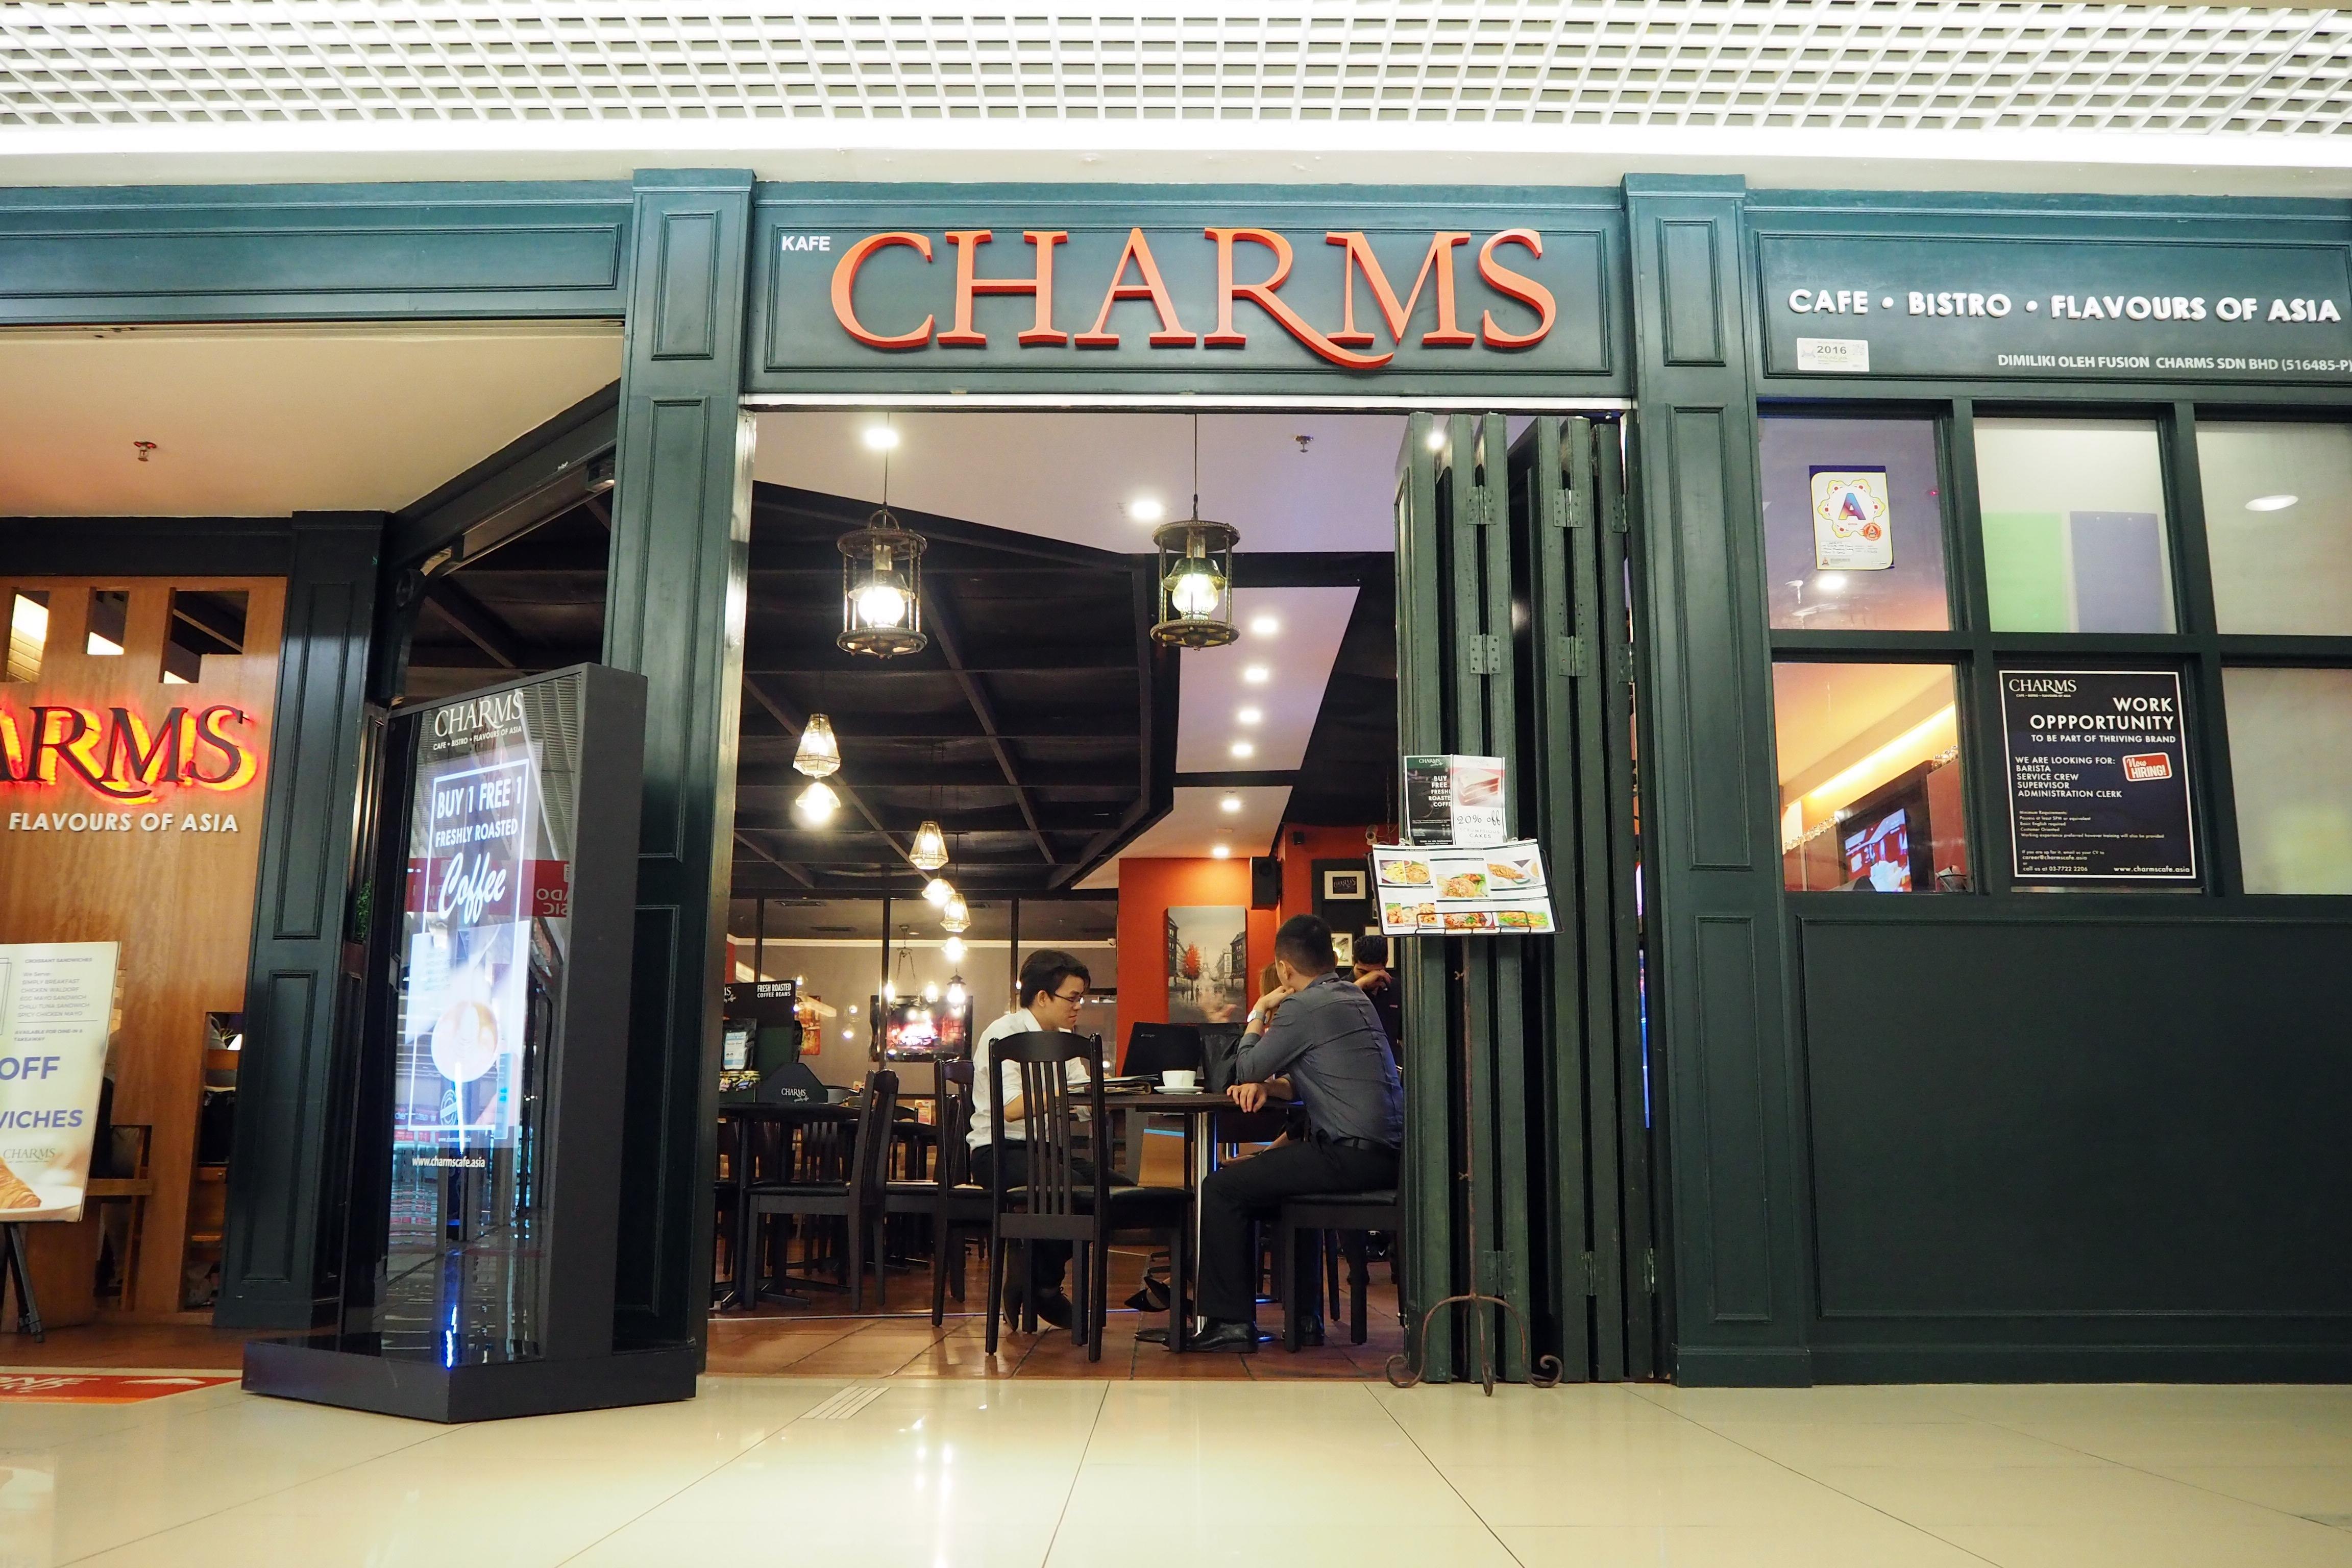 Charms Café Asia